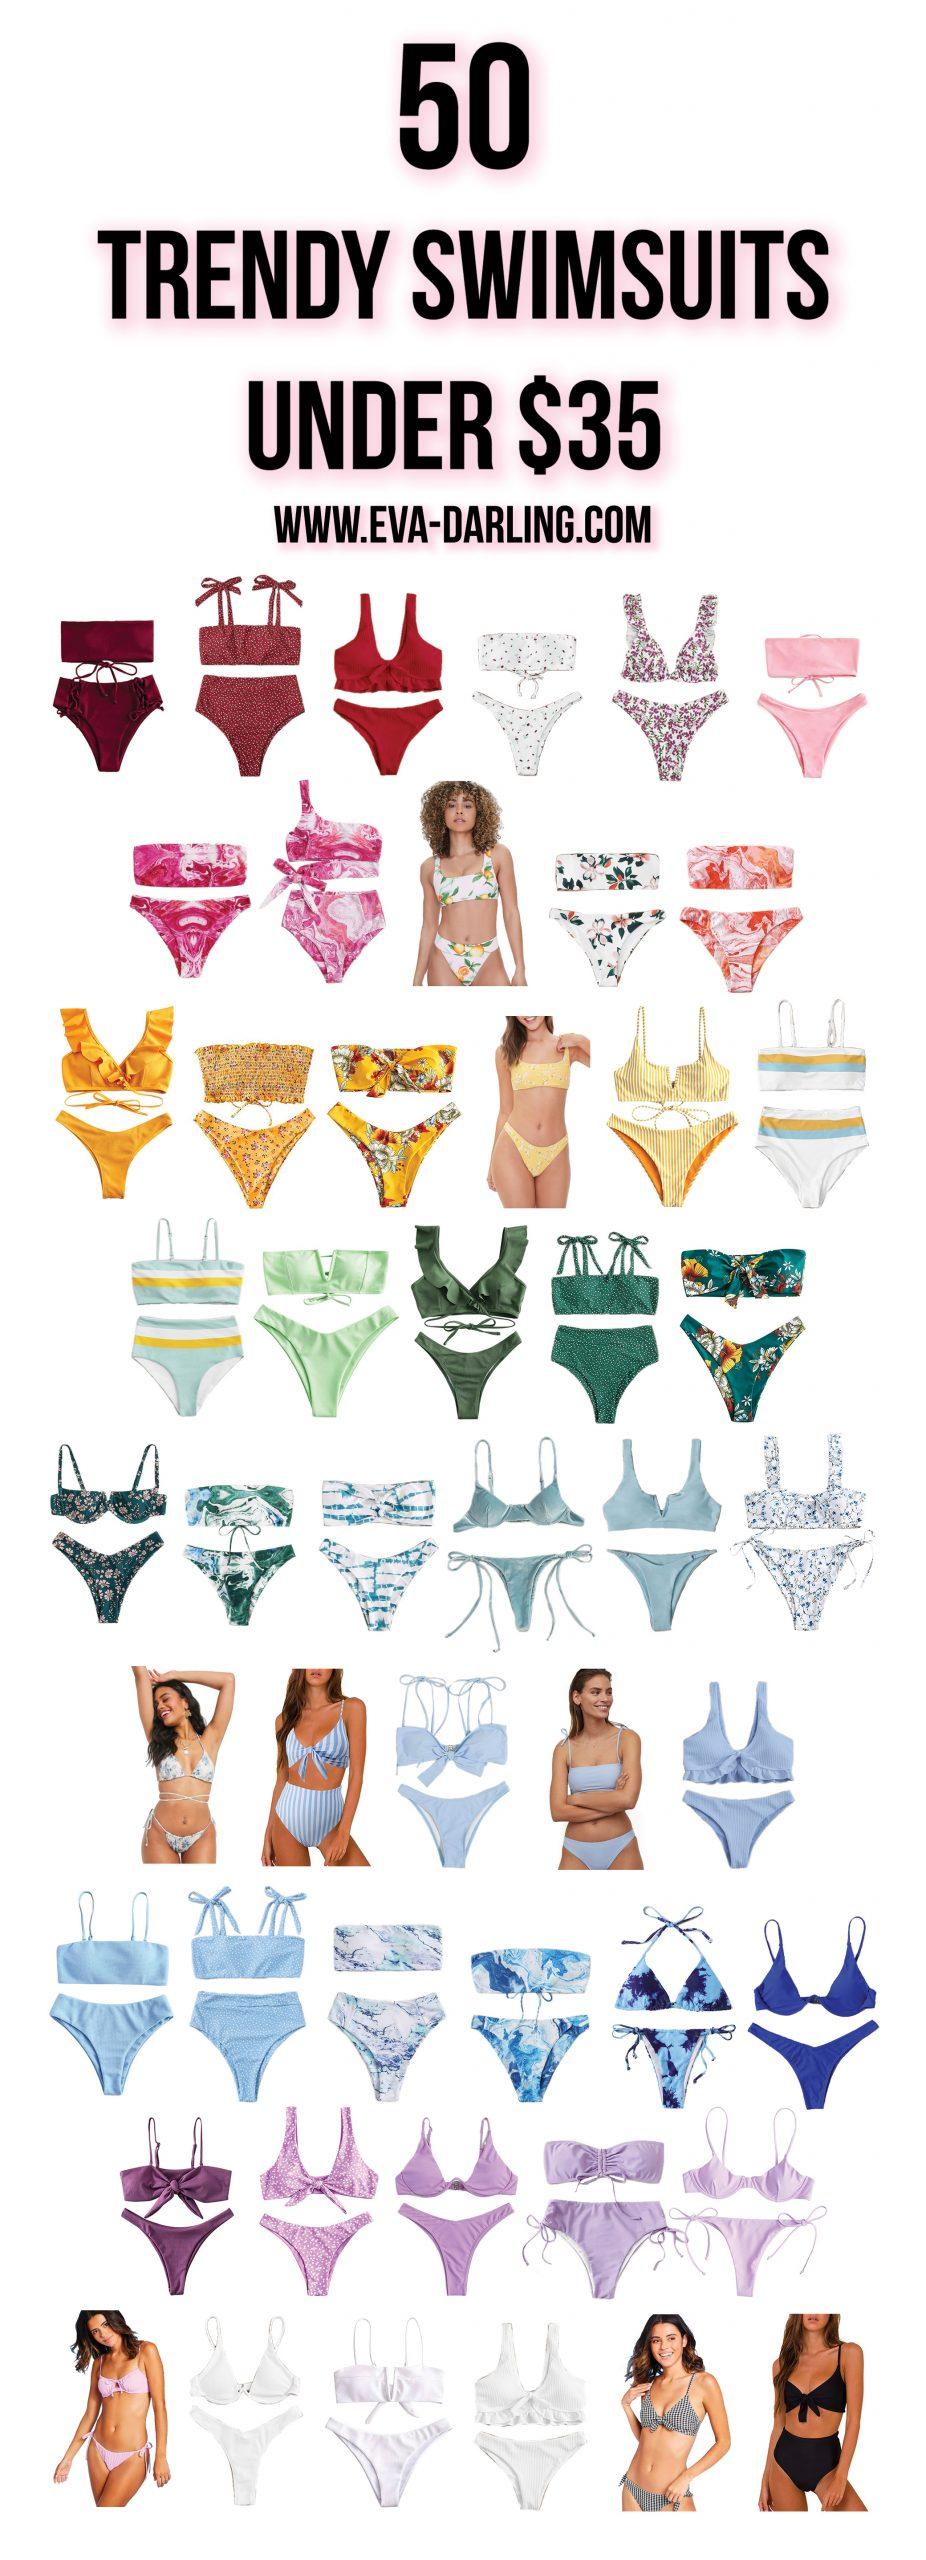 50 inexpensive bikinis flattering cute trendy swimwear cheap swimsuit shein romwe target high waisted waist high leg bikini tie dye floral trendy clothing college girl